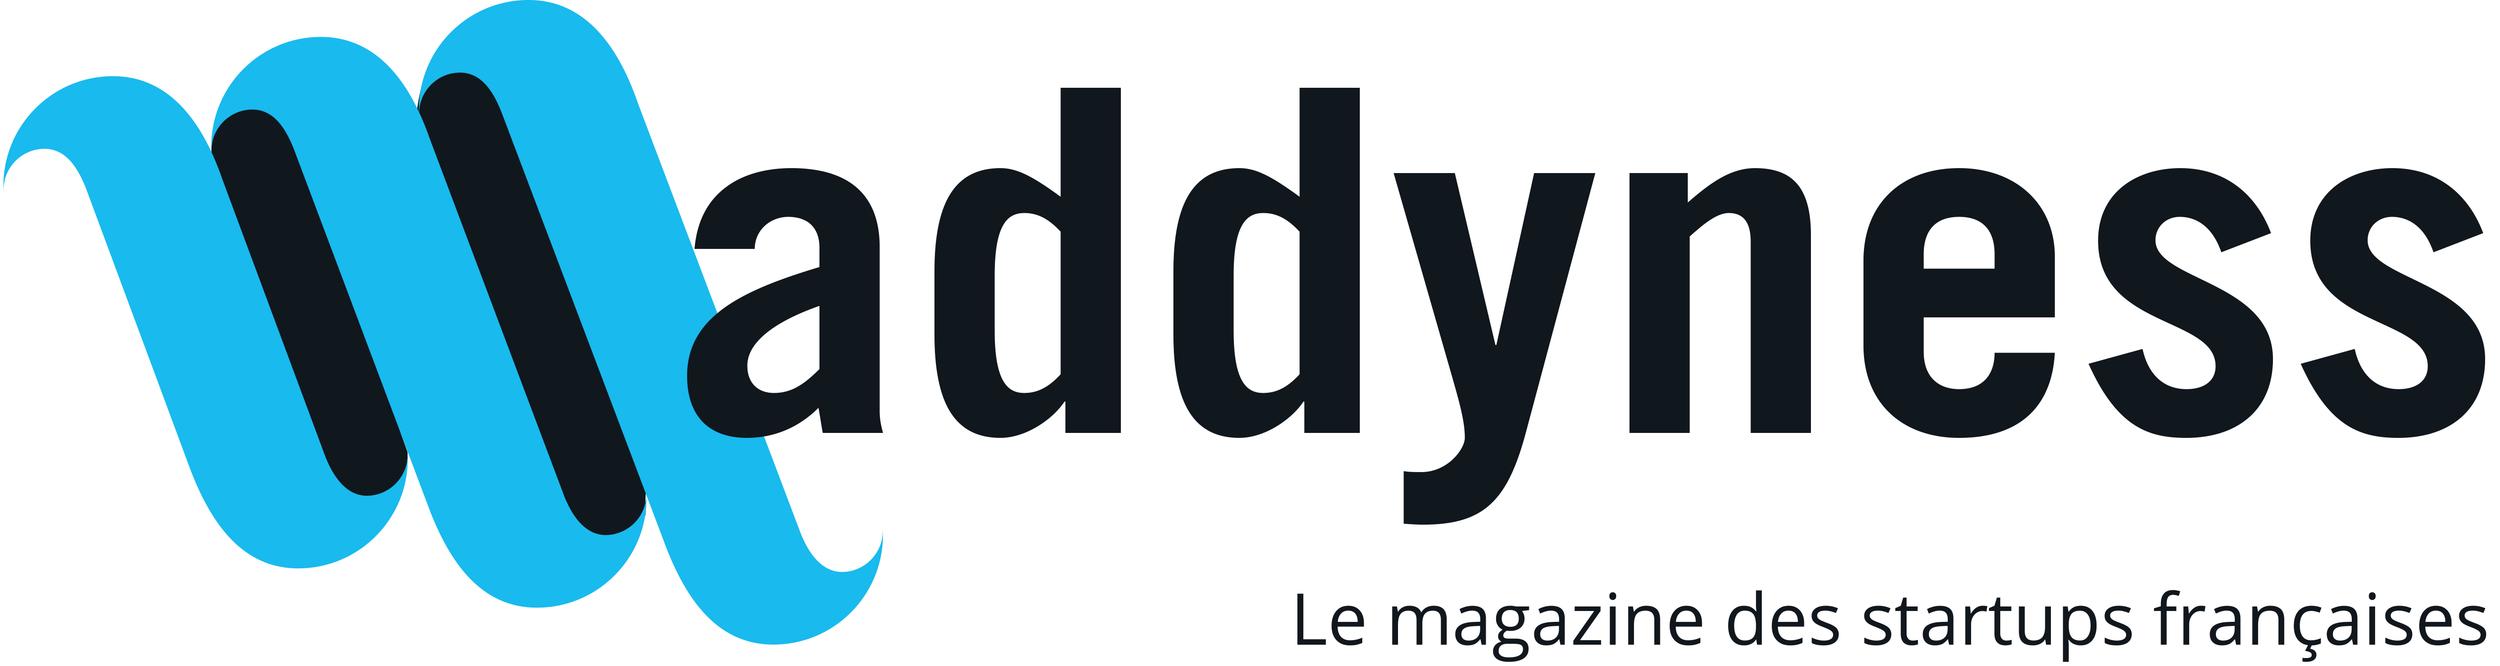 Logo Maddyness.jpg